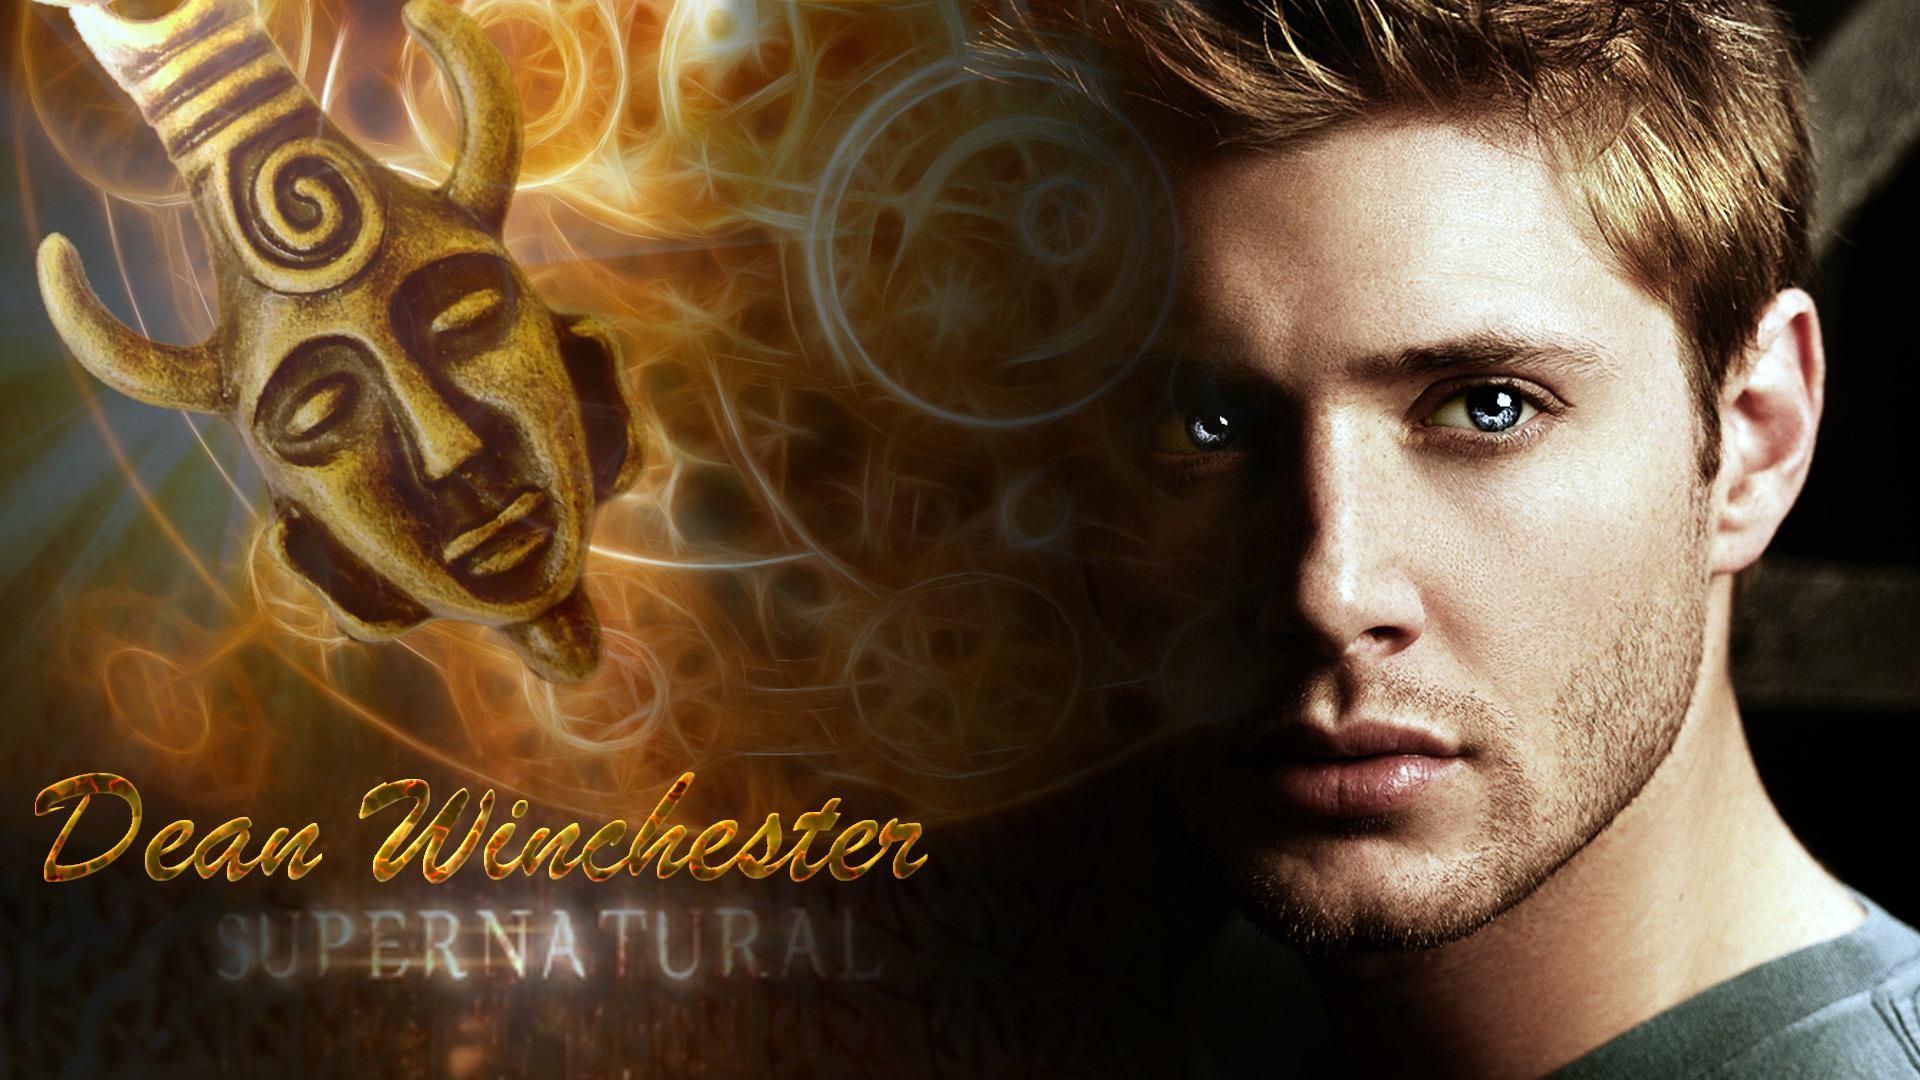 Dean Winchester Supernatural Wallpaper wallpaper uploaded on December .